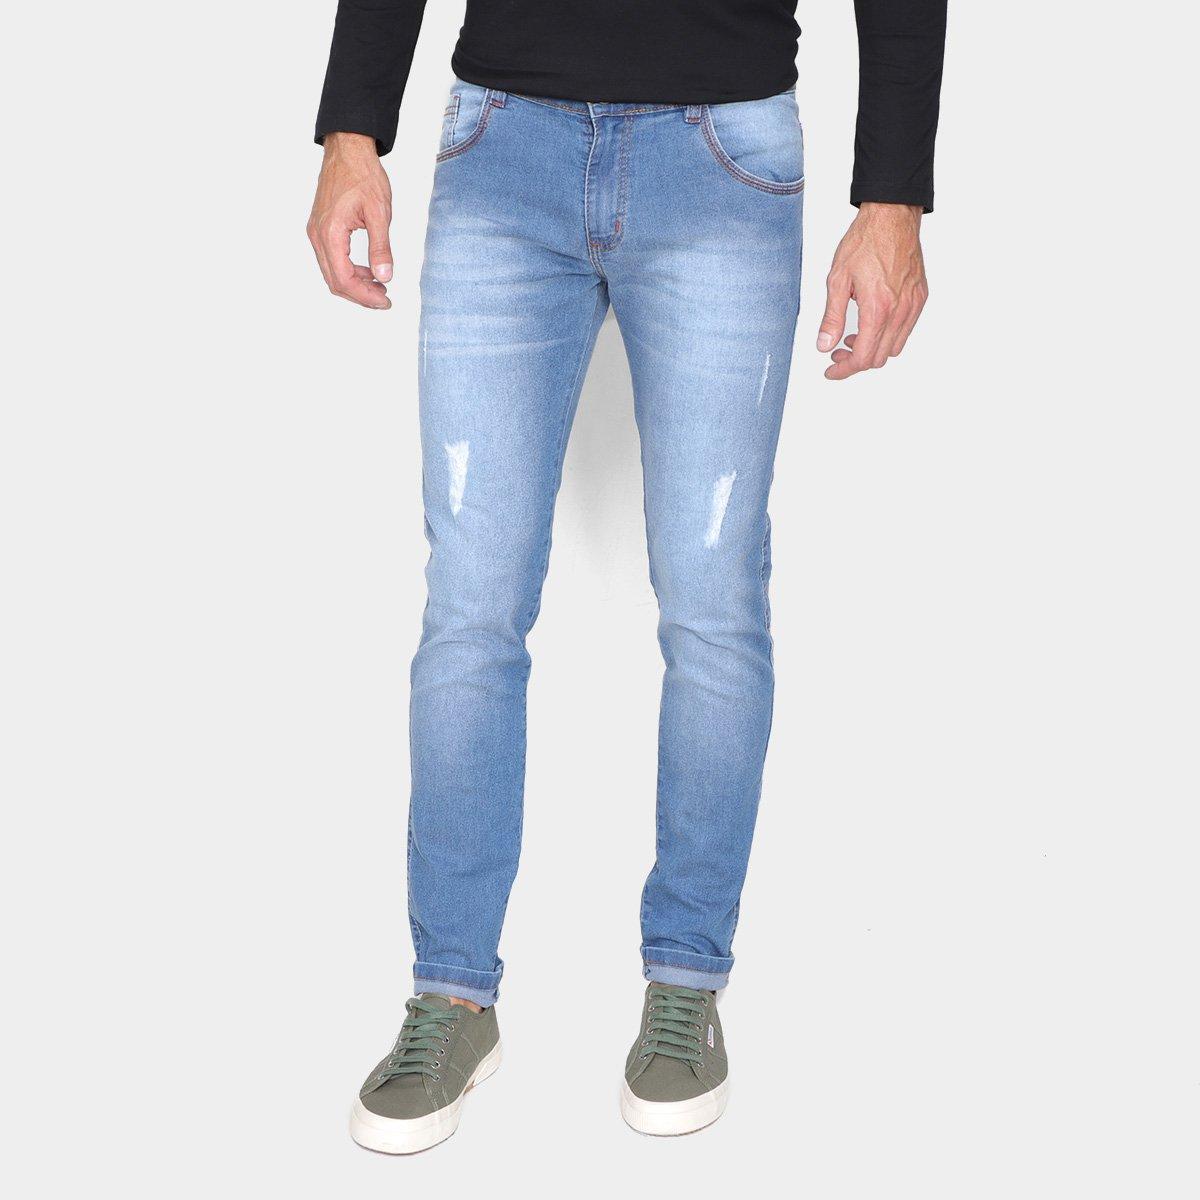 Calça Jeans Skinny Grifle Puídos Masculina